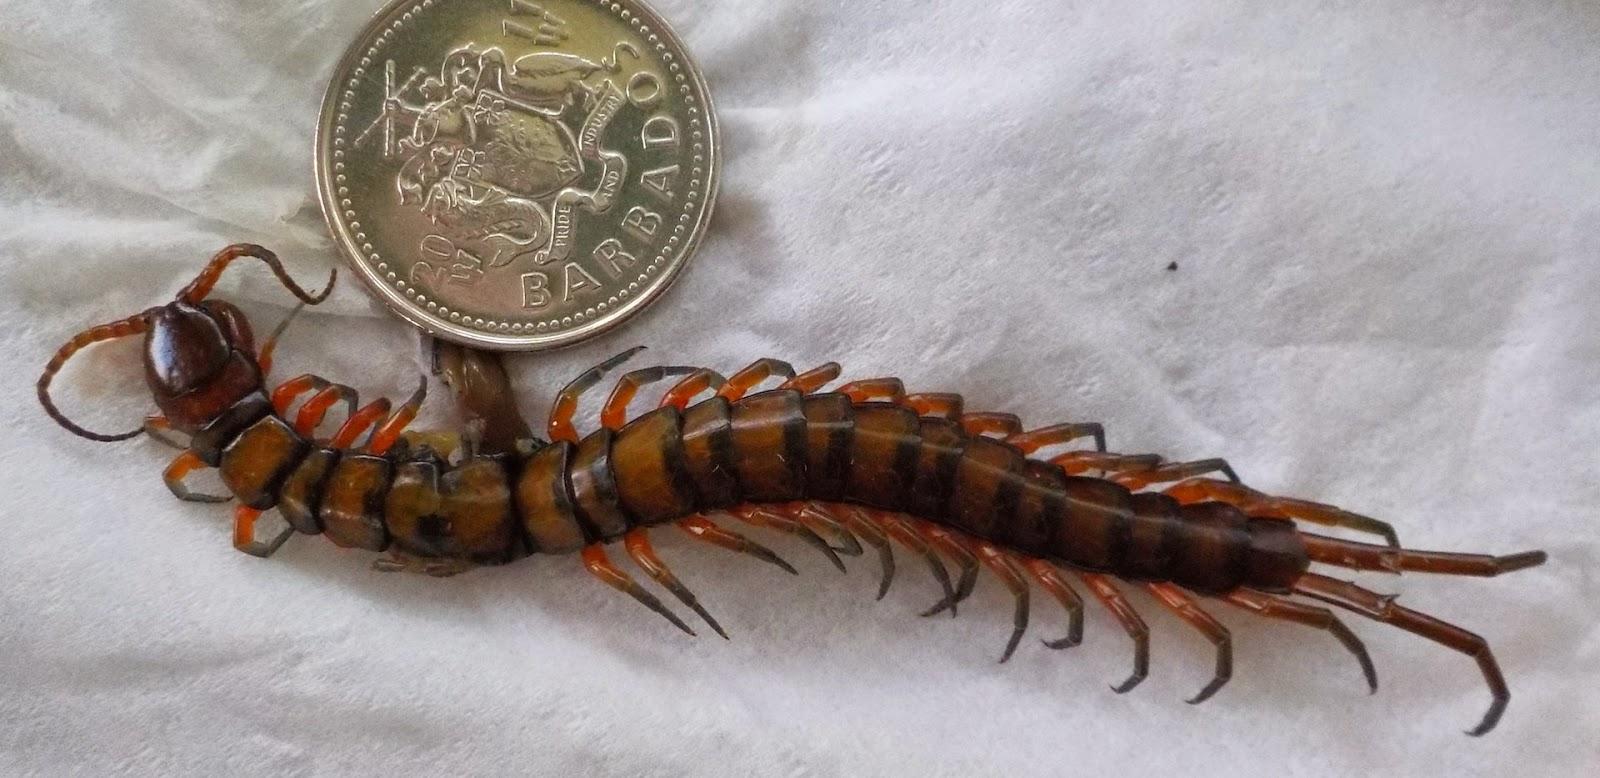 ThirdSpace: Amazonian Giant Centipede